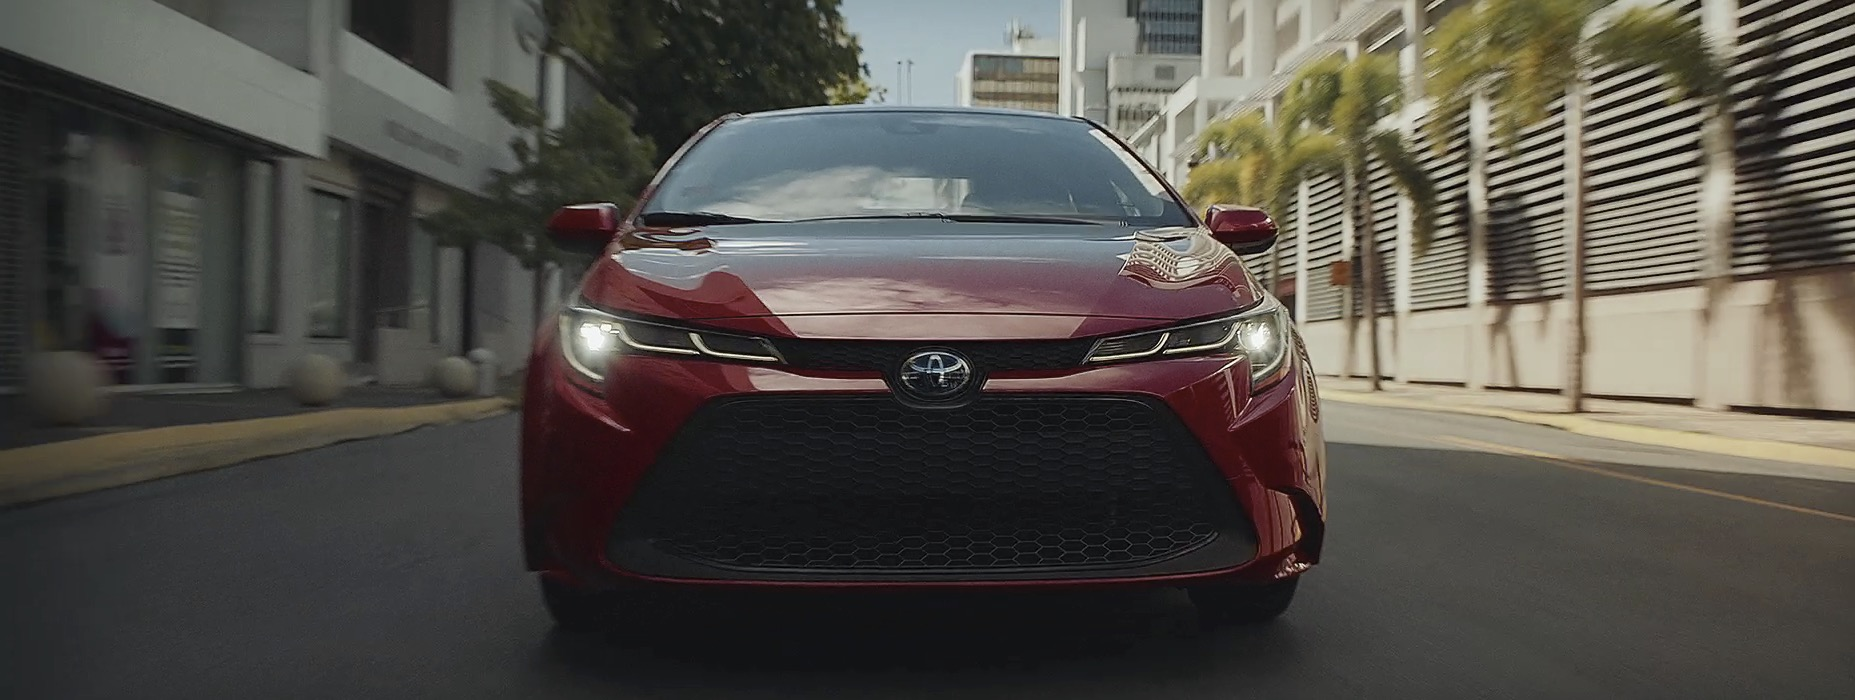 Toyota - Best Men Reel version